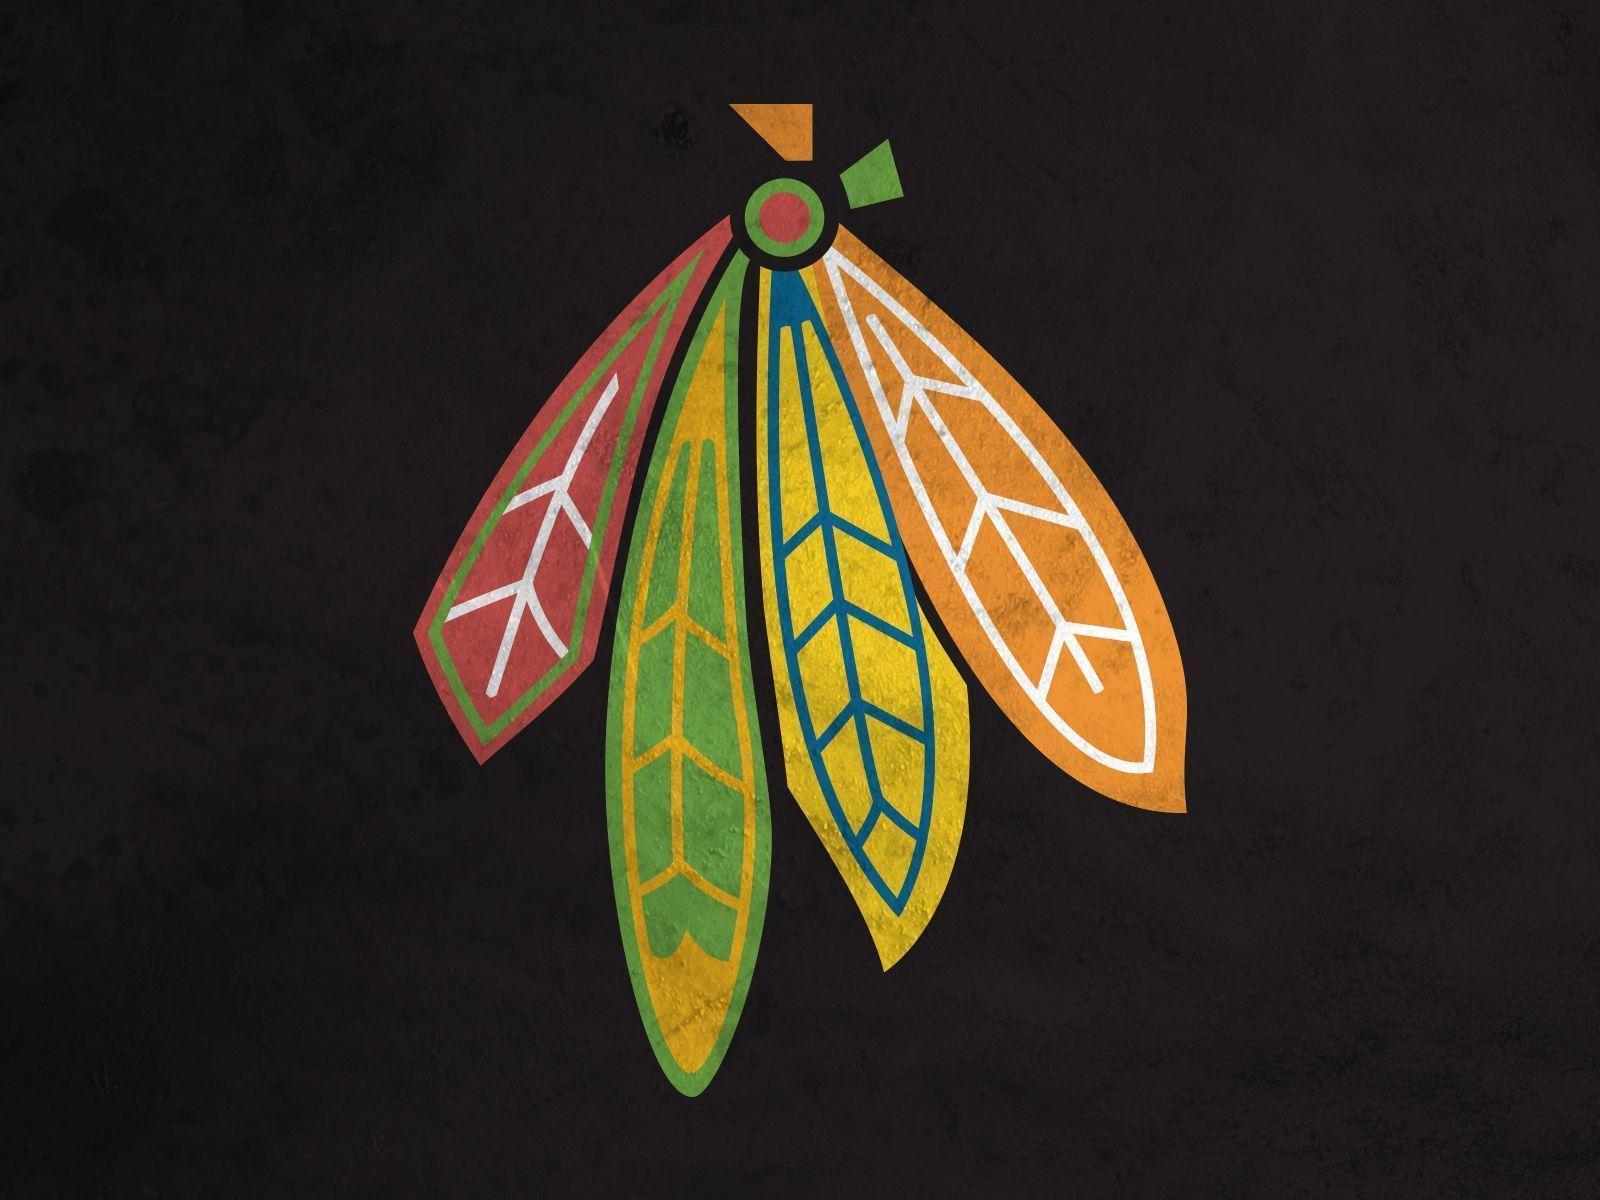 Chicago Sports Wallpaper Iphone 6: Chicago Blackhawks Wallpaper Border